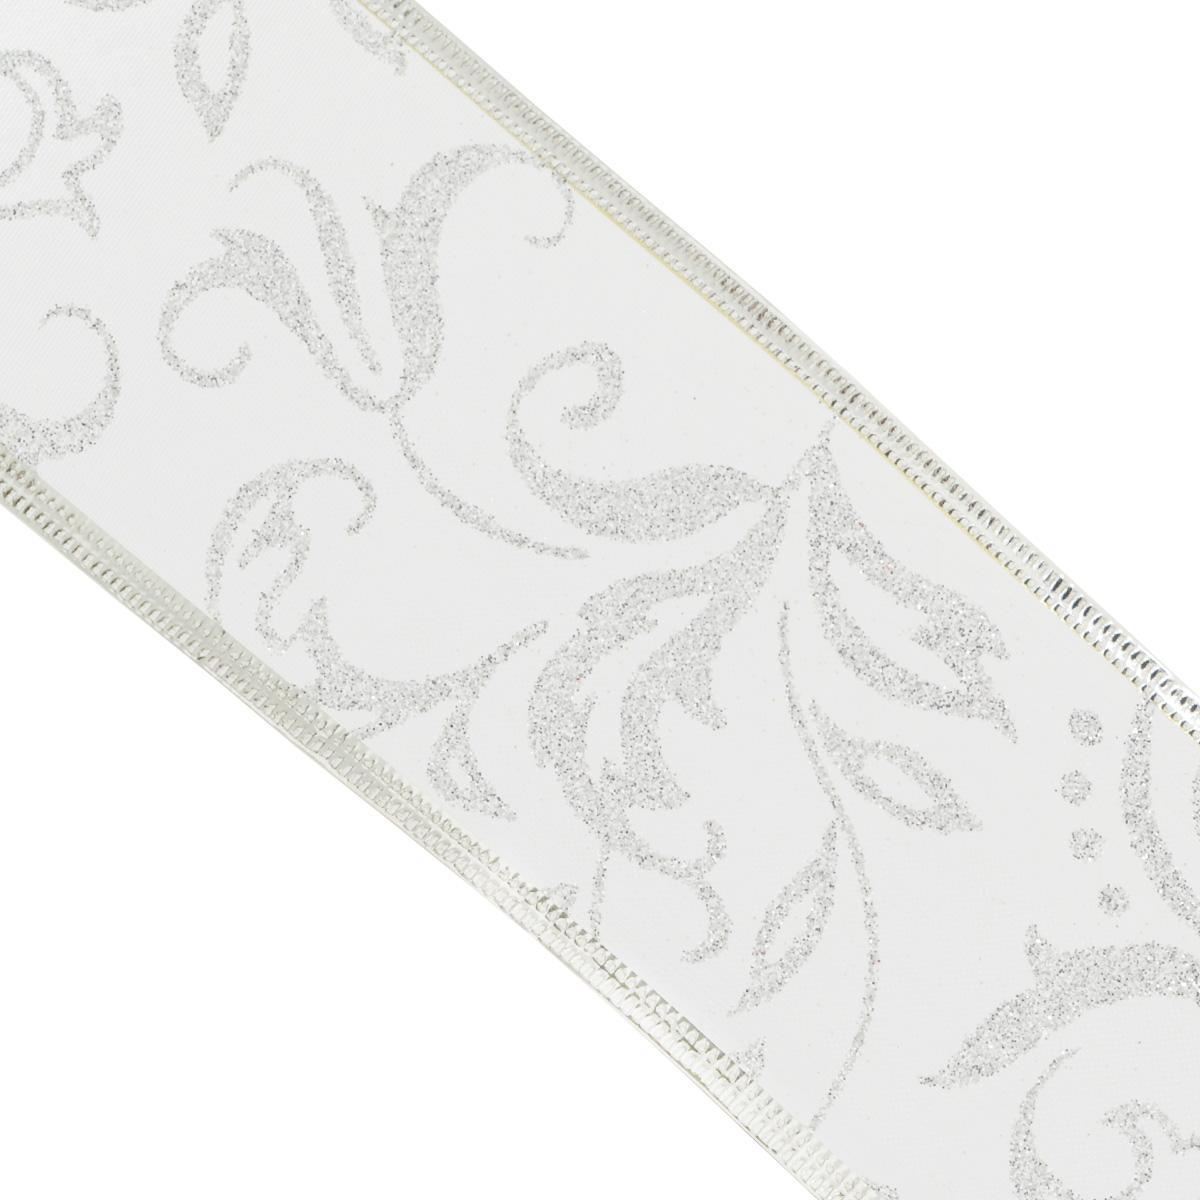 "Декоративная лента ""Феникс-презент"", цвет: сиреневый, 2,7 м. 35393"